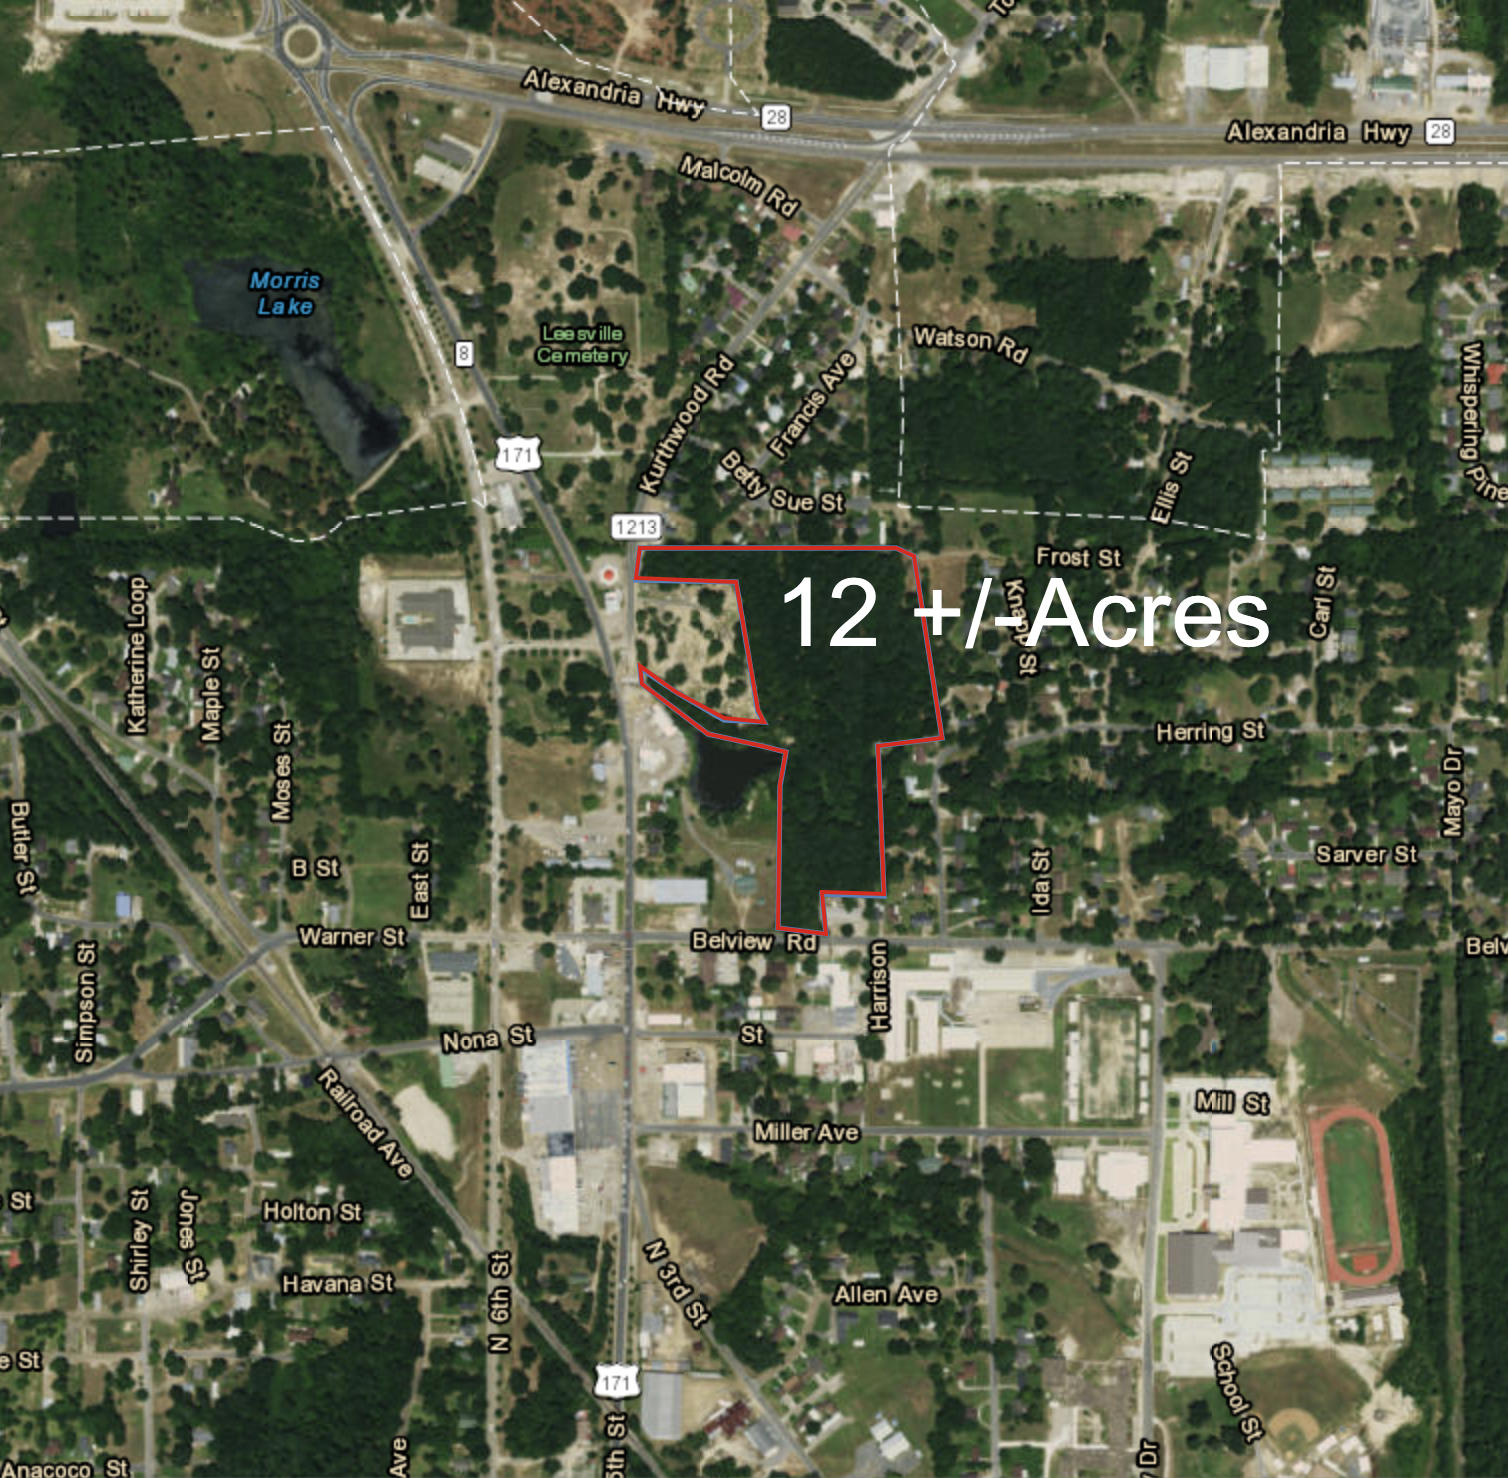 Leesville commercial property for sale, TBD Belview Rd, Leesville LA - $599,000